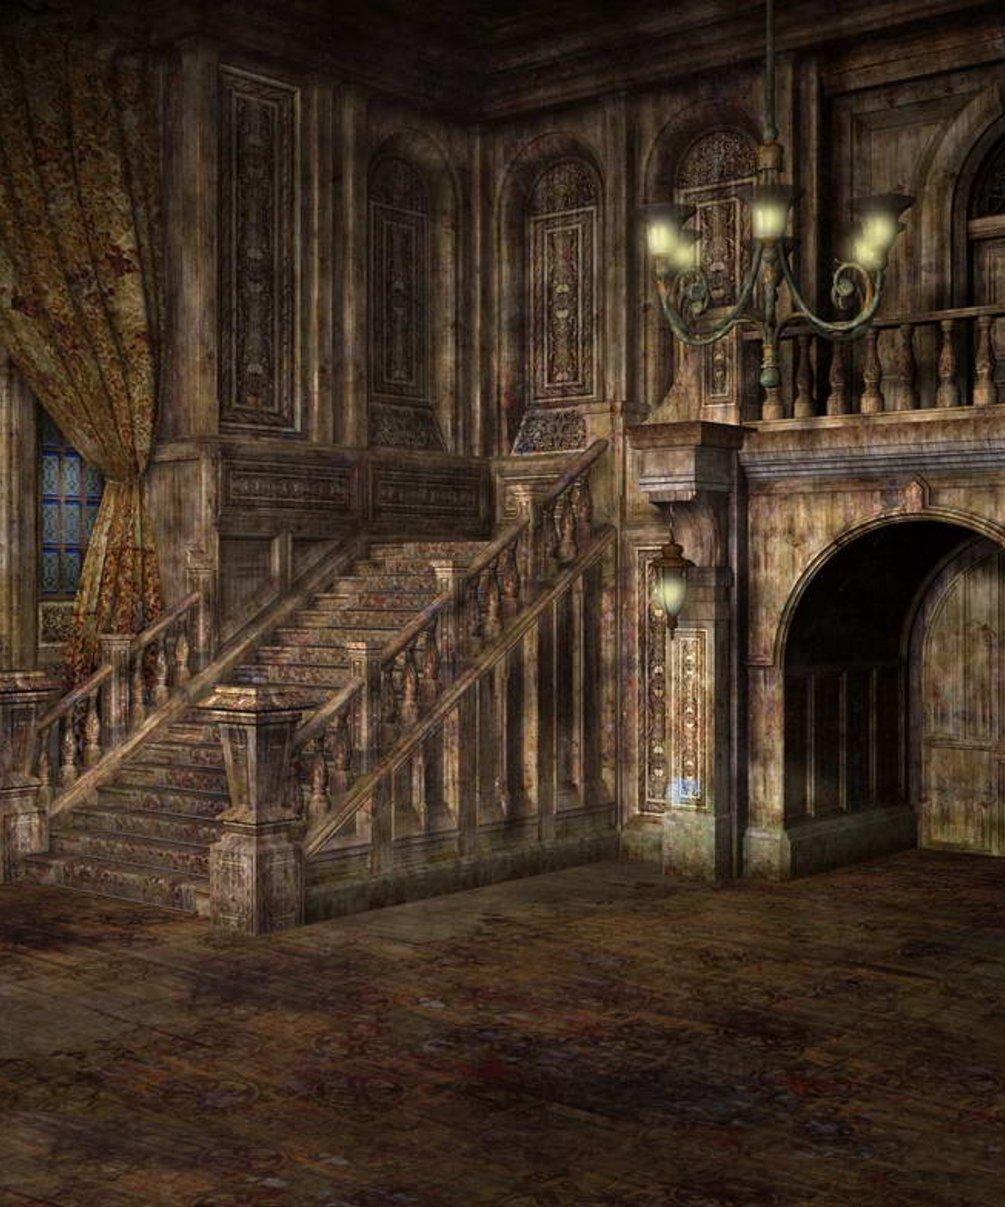 Decoratingspecial Com: Vintage Interior Backgrounds